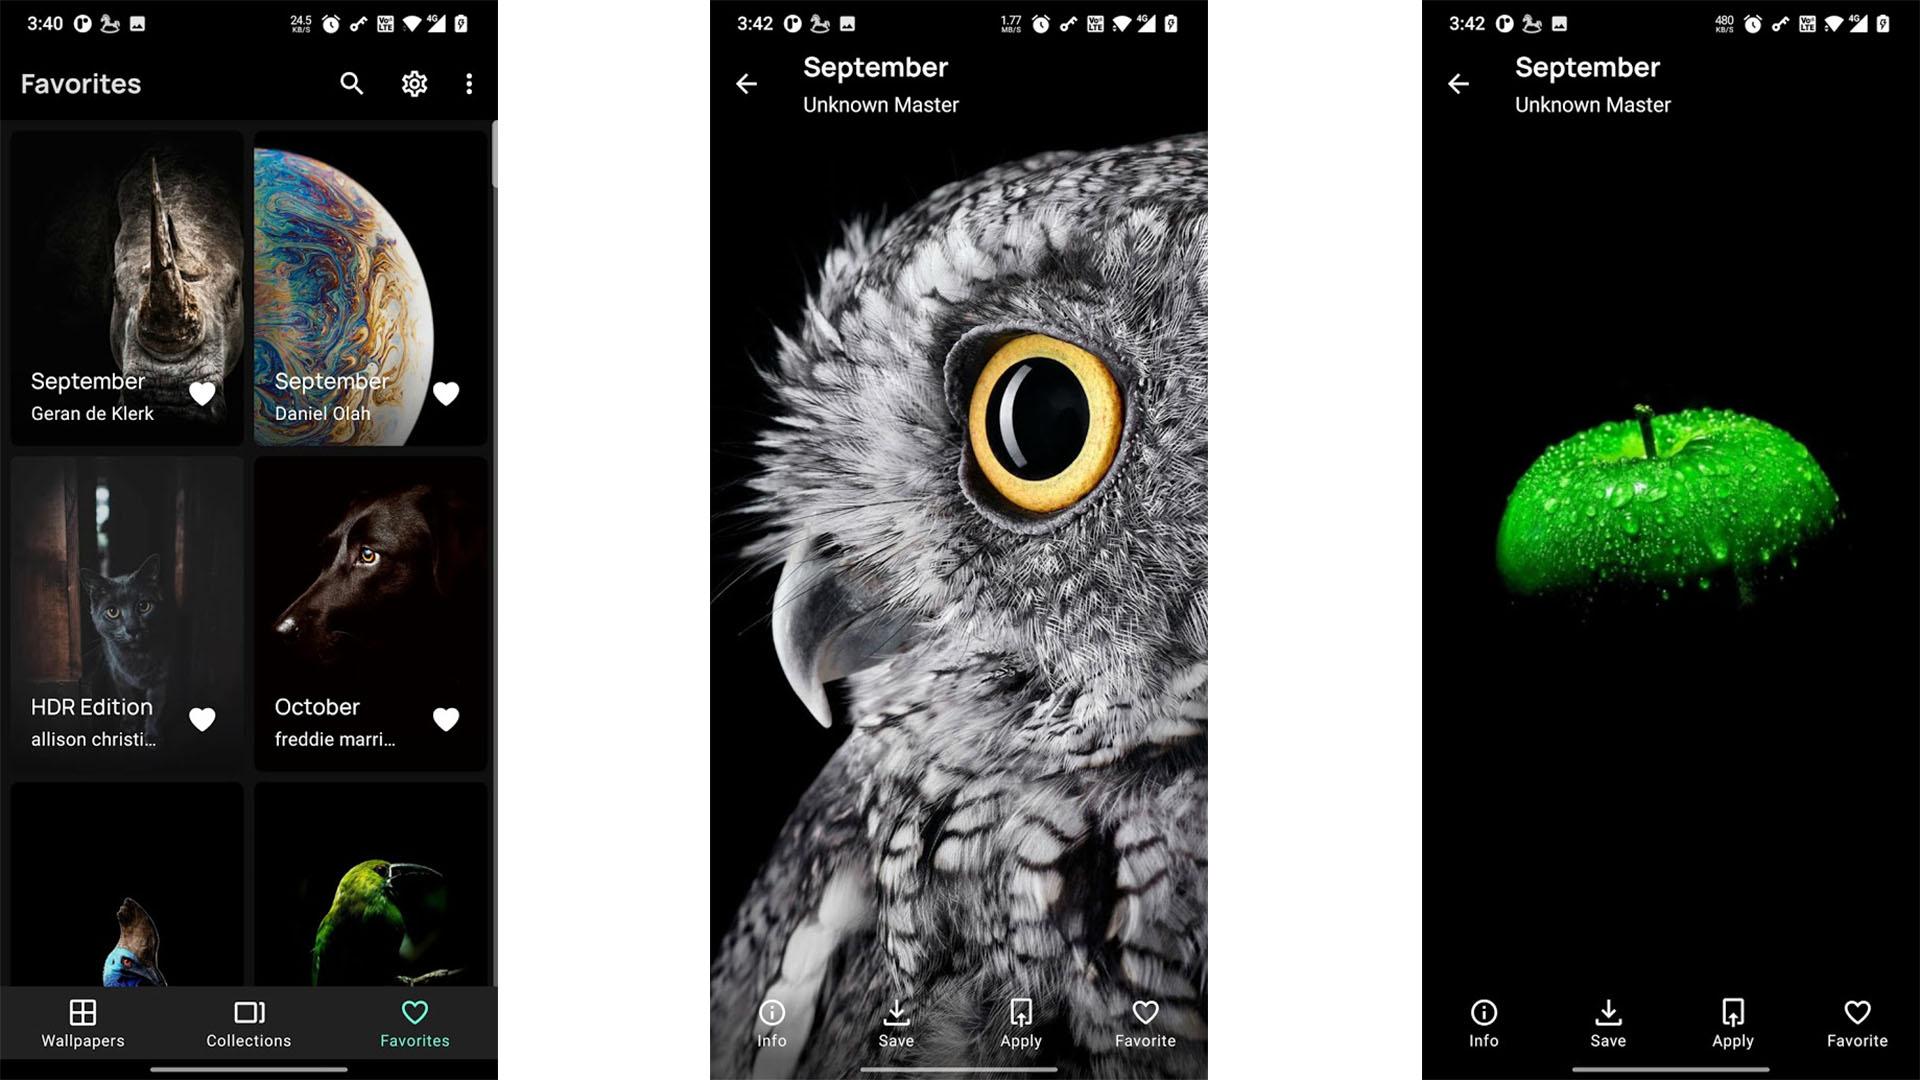 AMOLED Wallpapers No Ads screenshot 2021